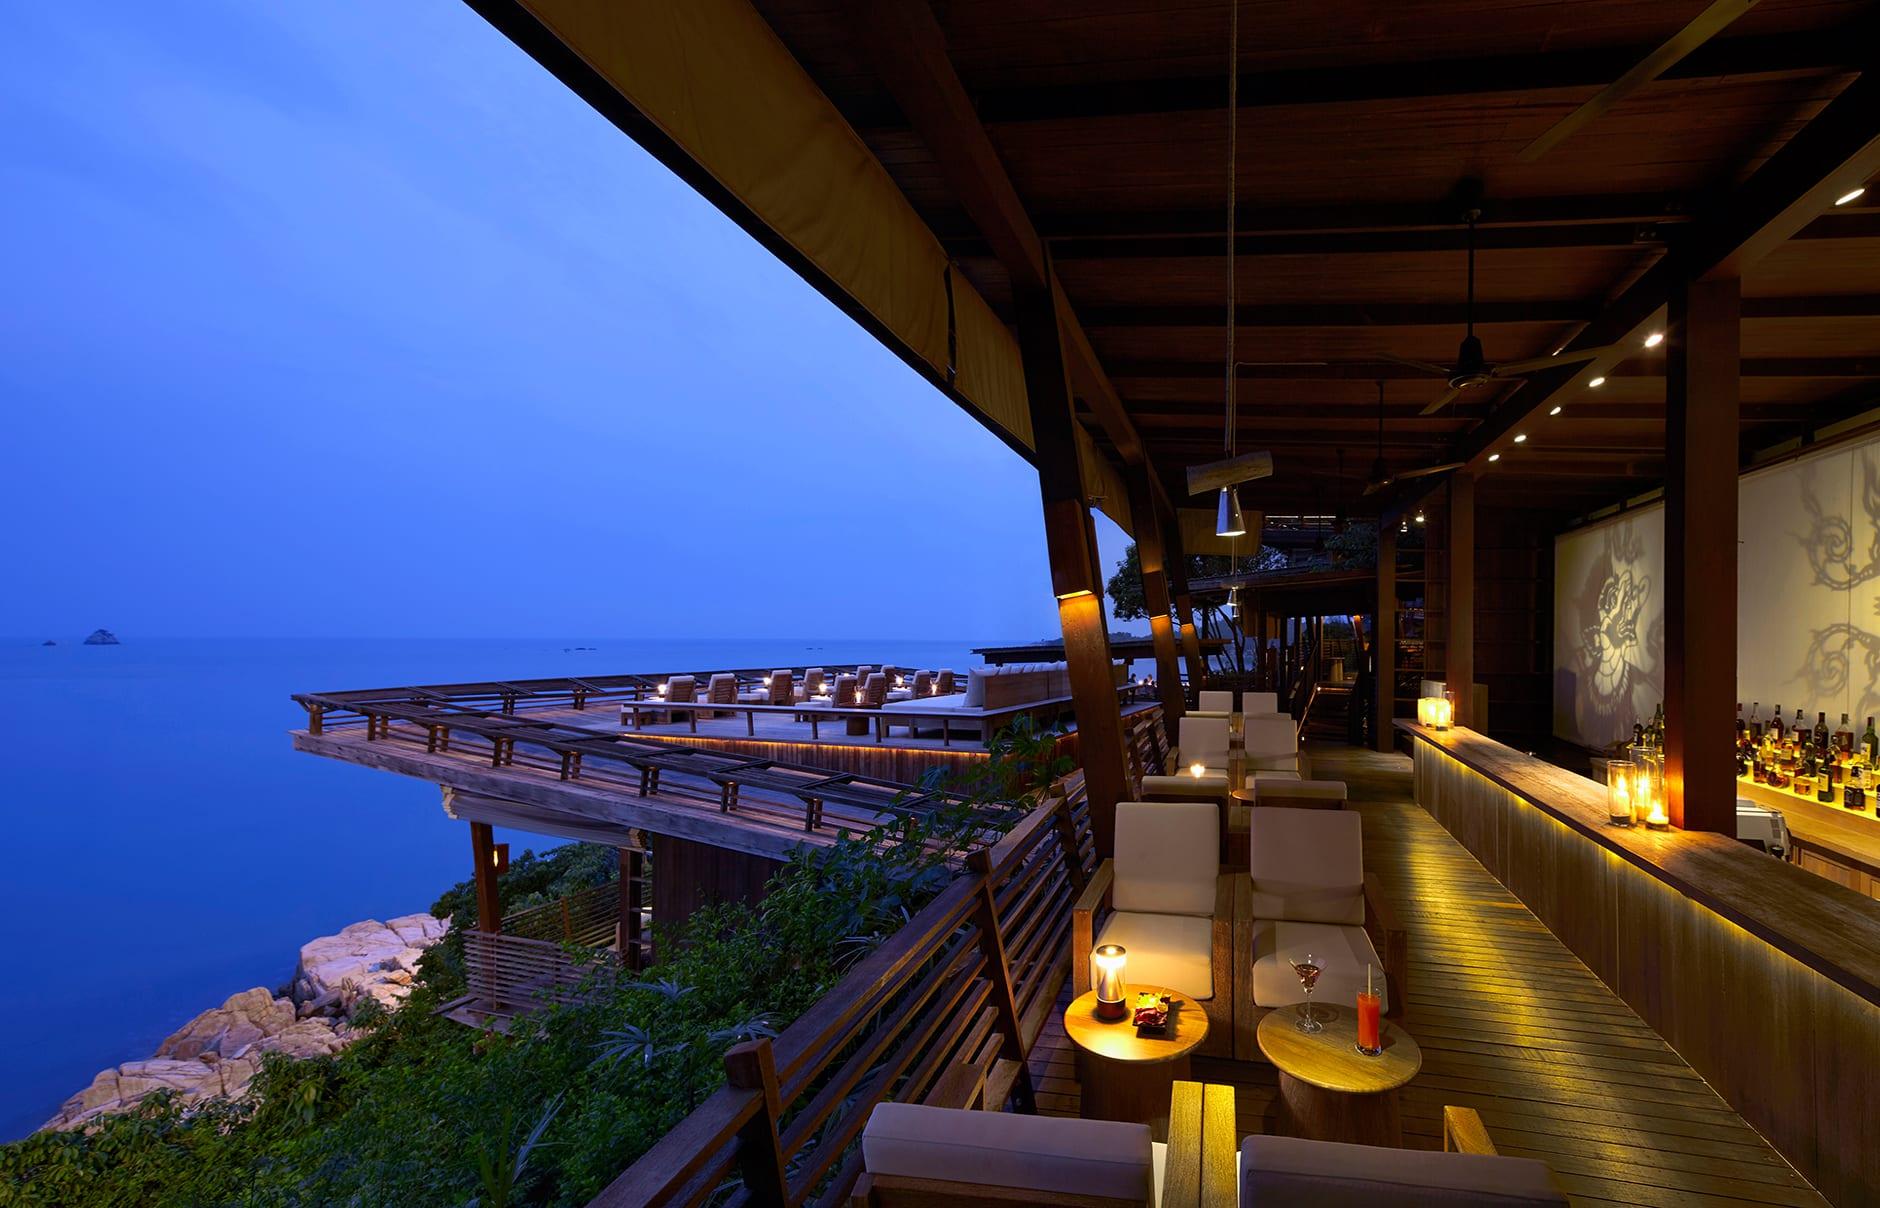 Dining on the Rocks. Six Senses Samui, Thailand. © Six Senses Resorts & Spas